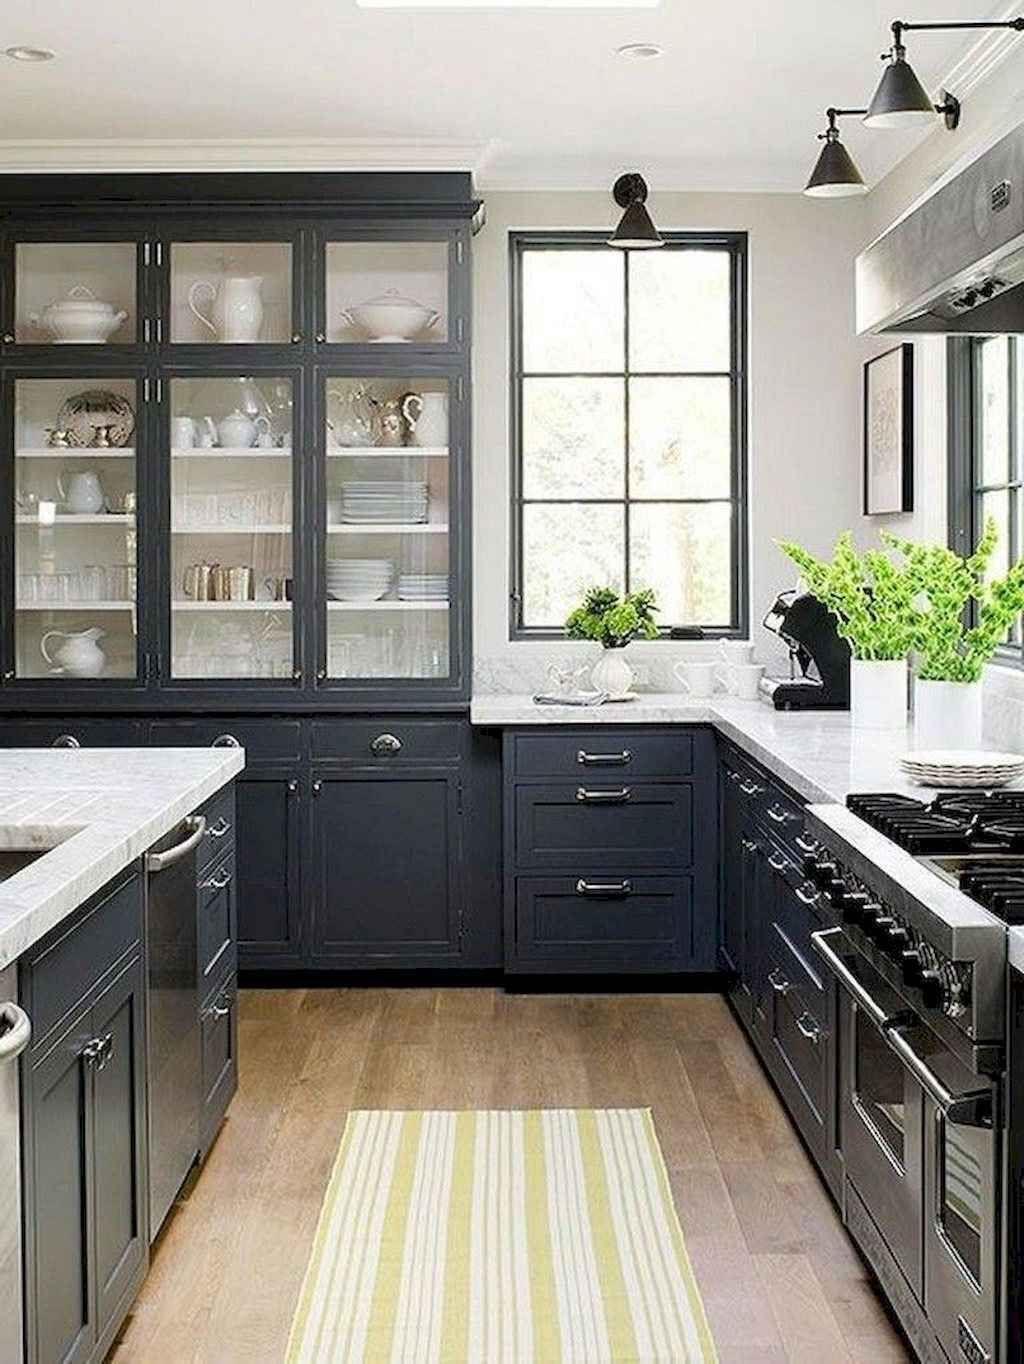 50 modern farmhouse kitchen cabinet makeover ideas kitchen design black kitchen cabinets on kitchen ideas gray id=79288